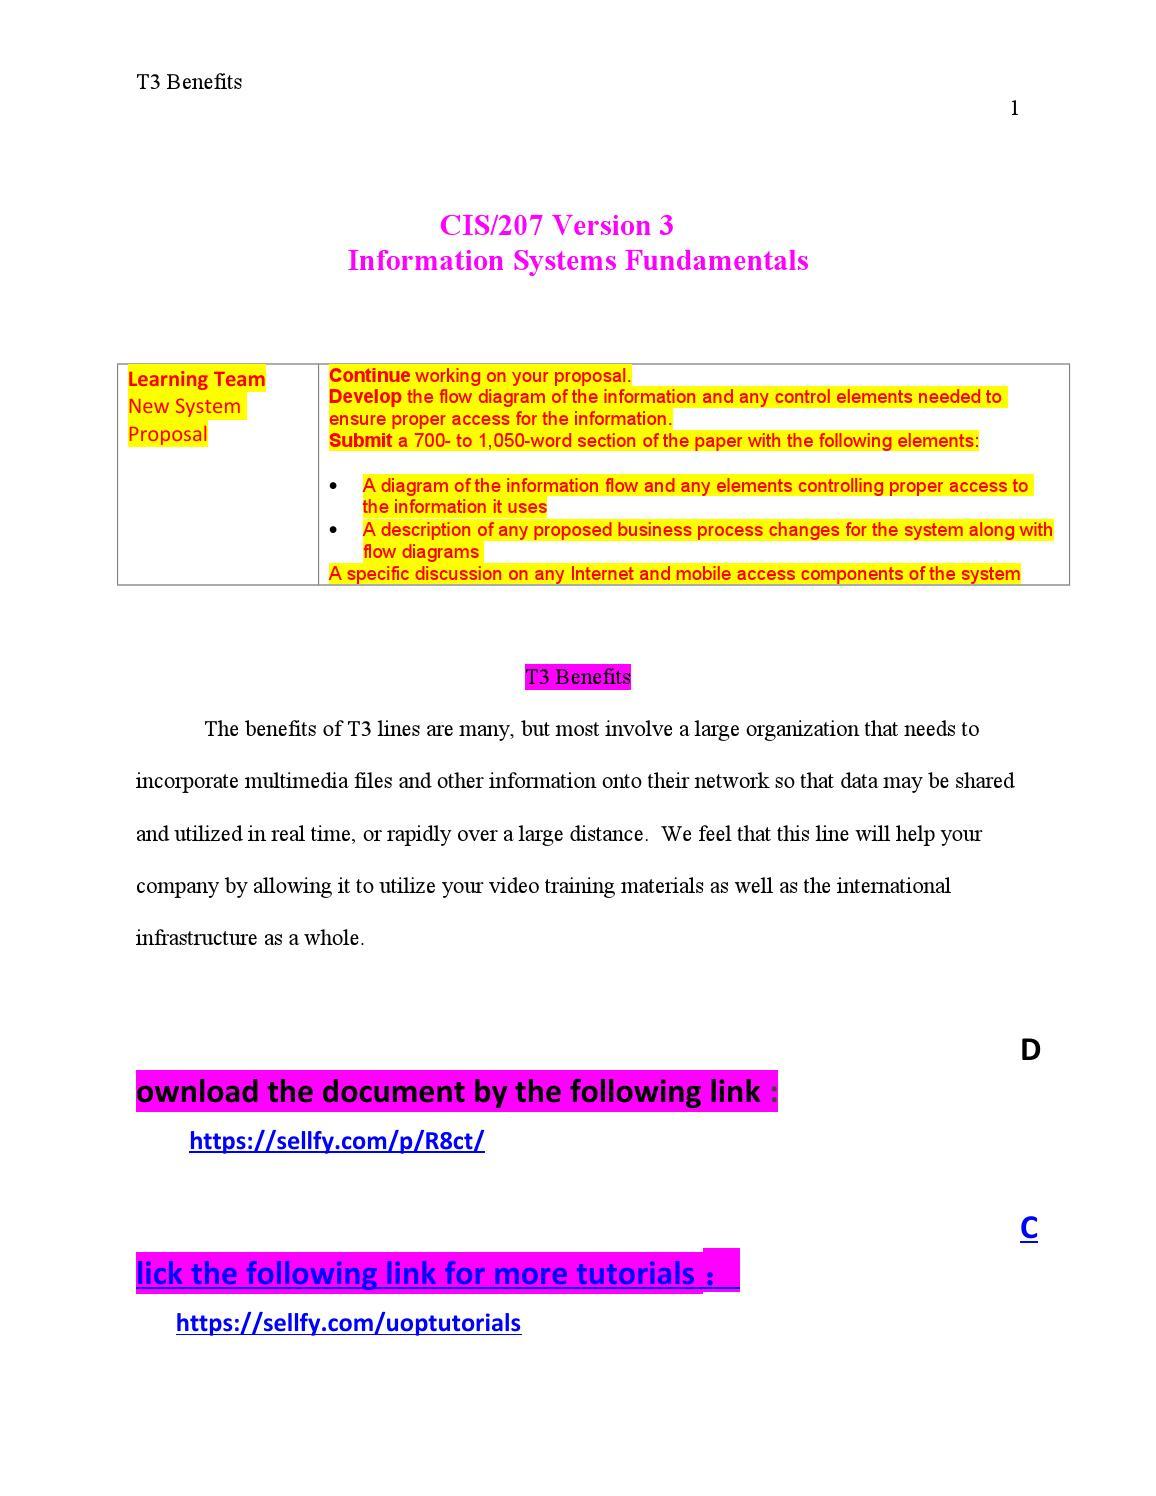 Cis 207 Week 3 Learning Team Process Flow Diagram Paper By Uses Phoenixtutor Issuu